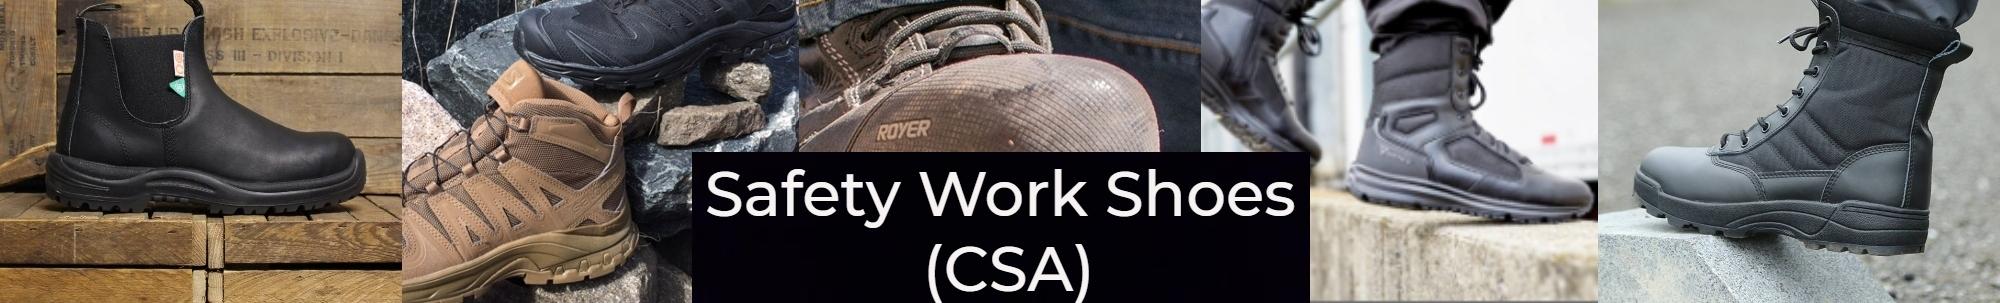 boots-CSAMALE182555.jpg